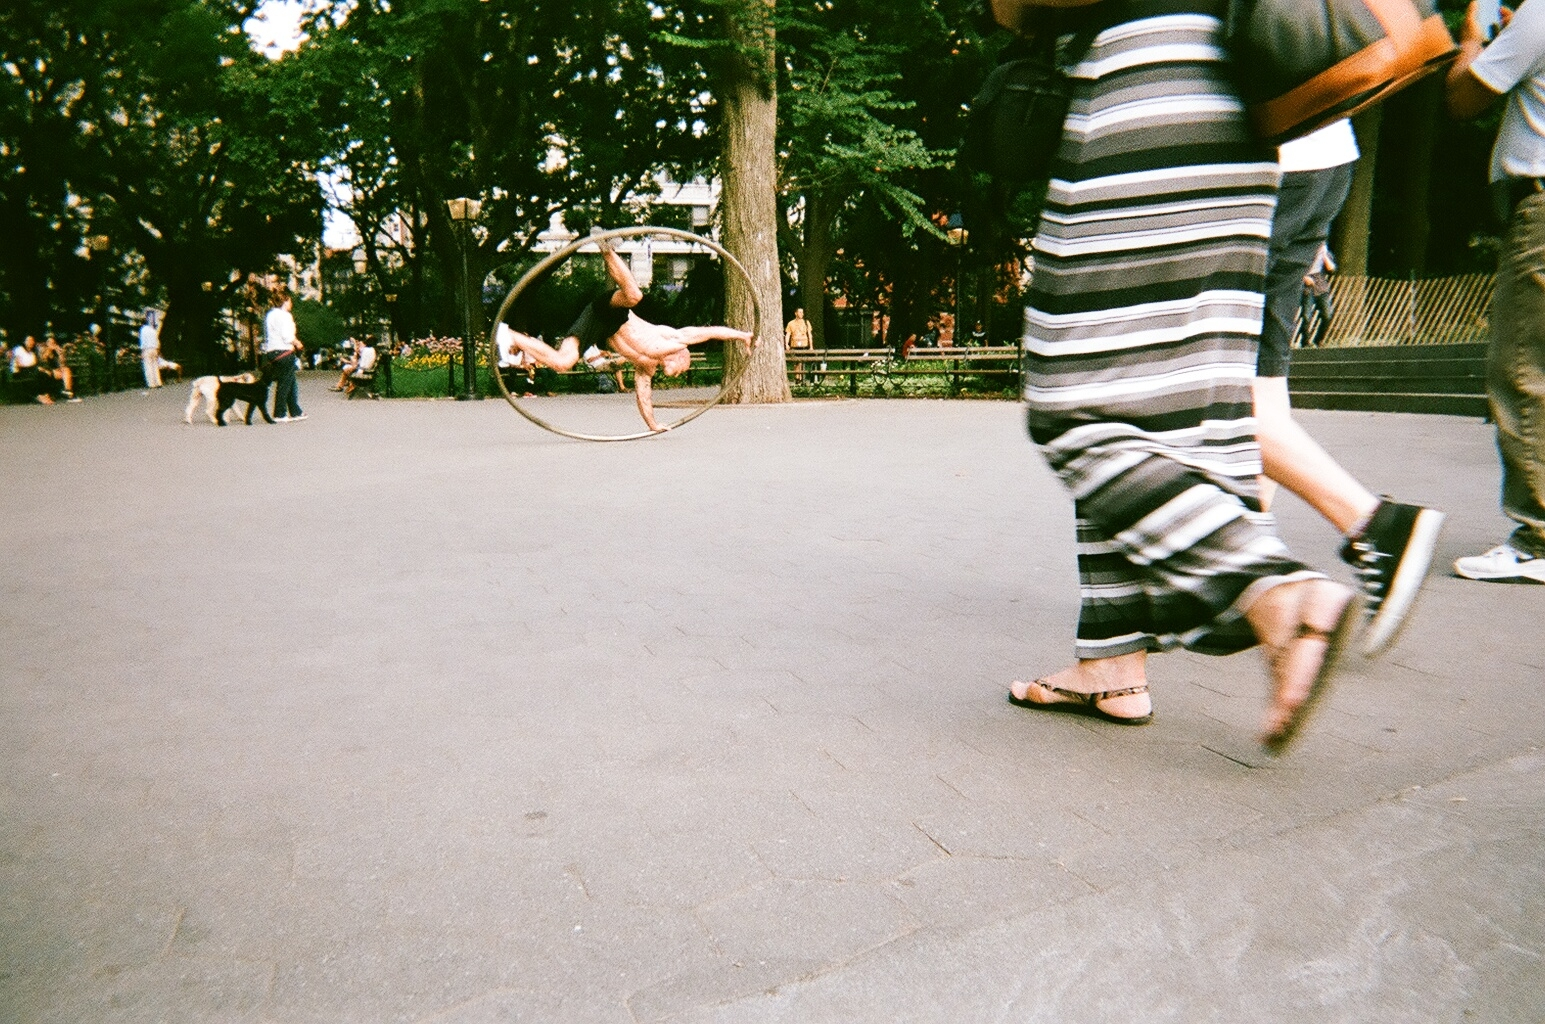 washington square park  new york city  photography: Alex Rose